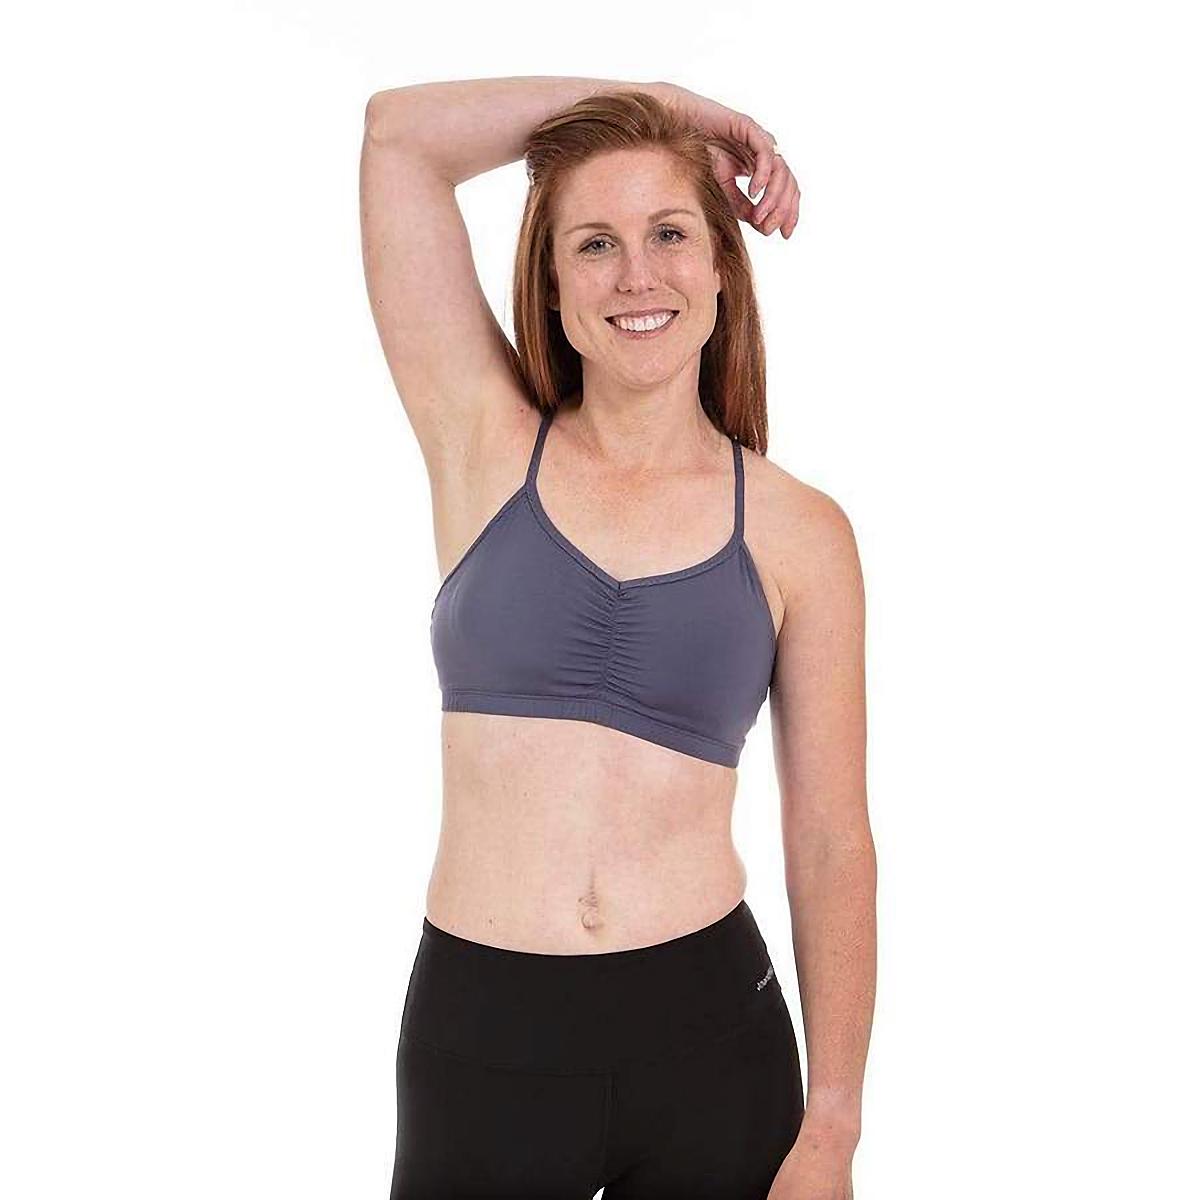 Women's Handful Adjustable Bra - Color: Dreamcatcher - Size: XS, Dreamcatcher, large, image 3